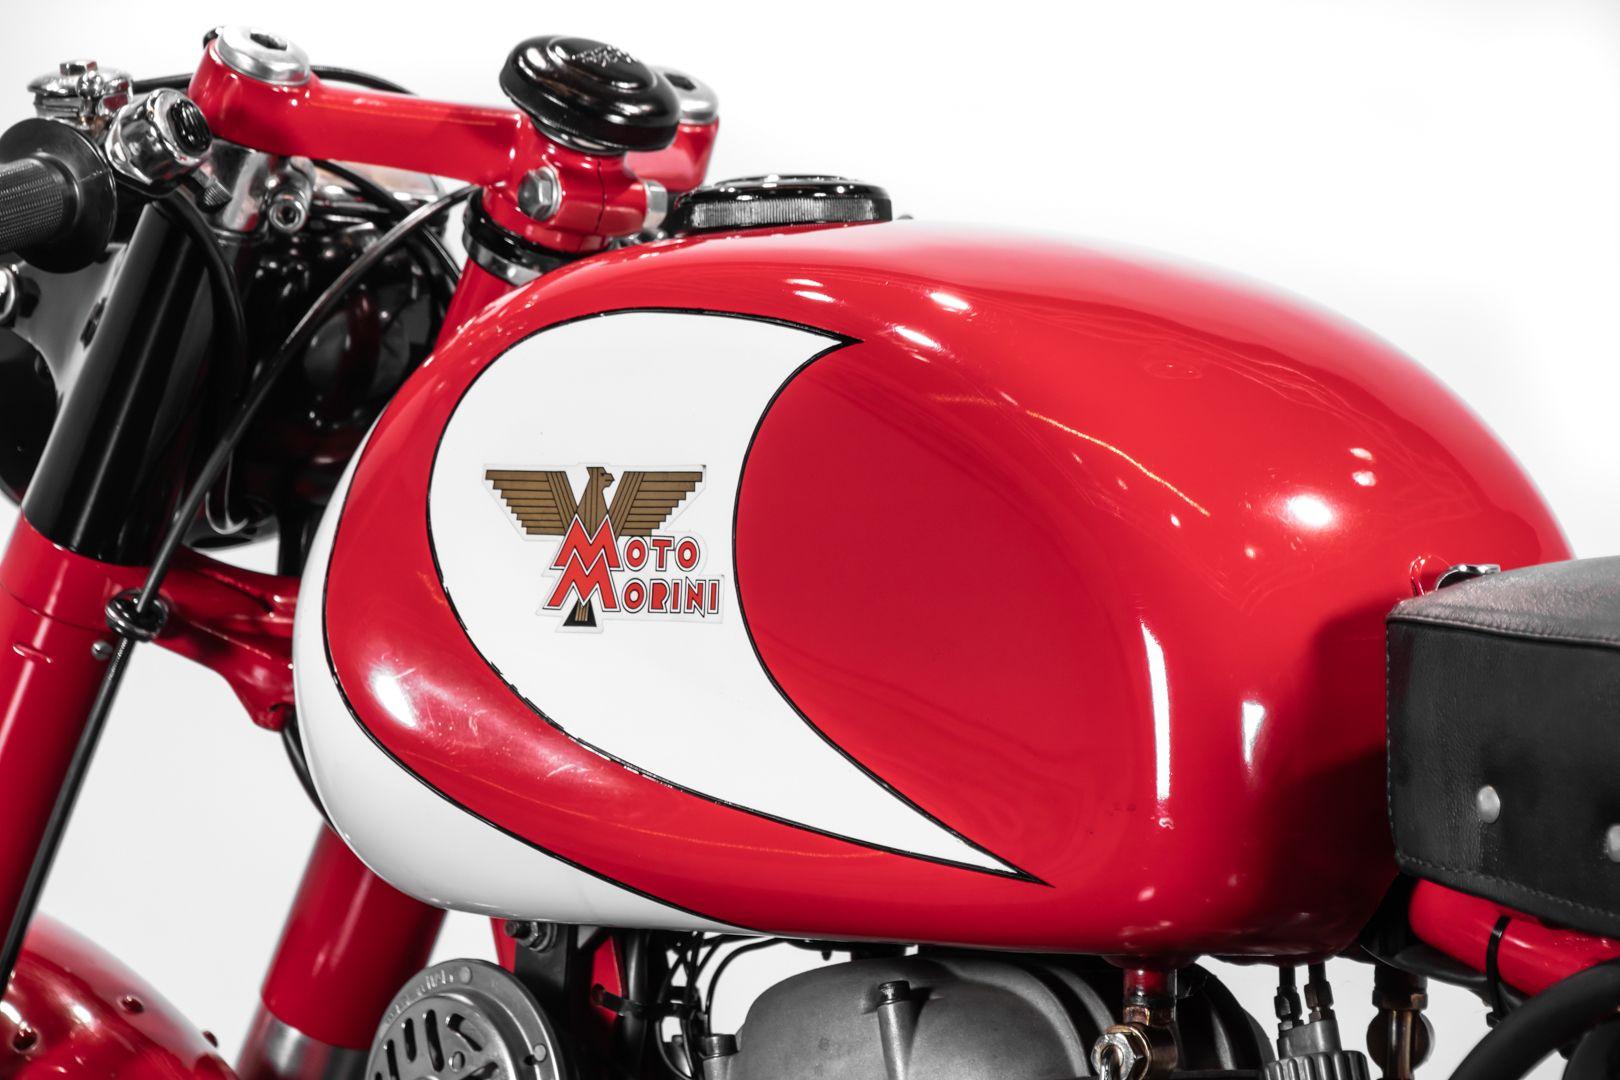 1958 Moto Morini S 175 78017